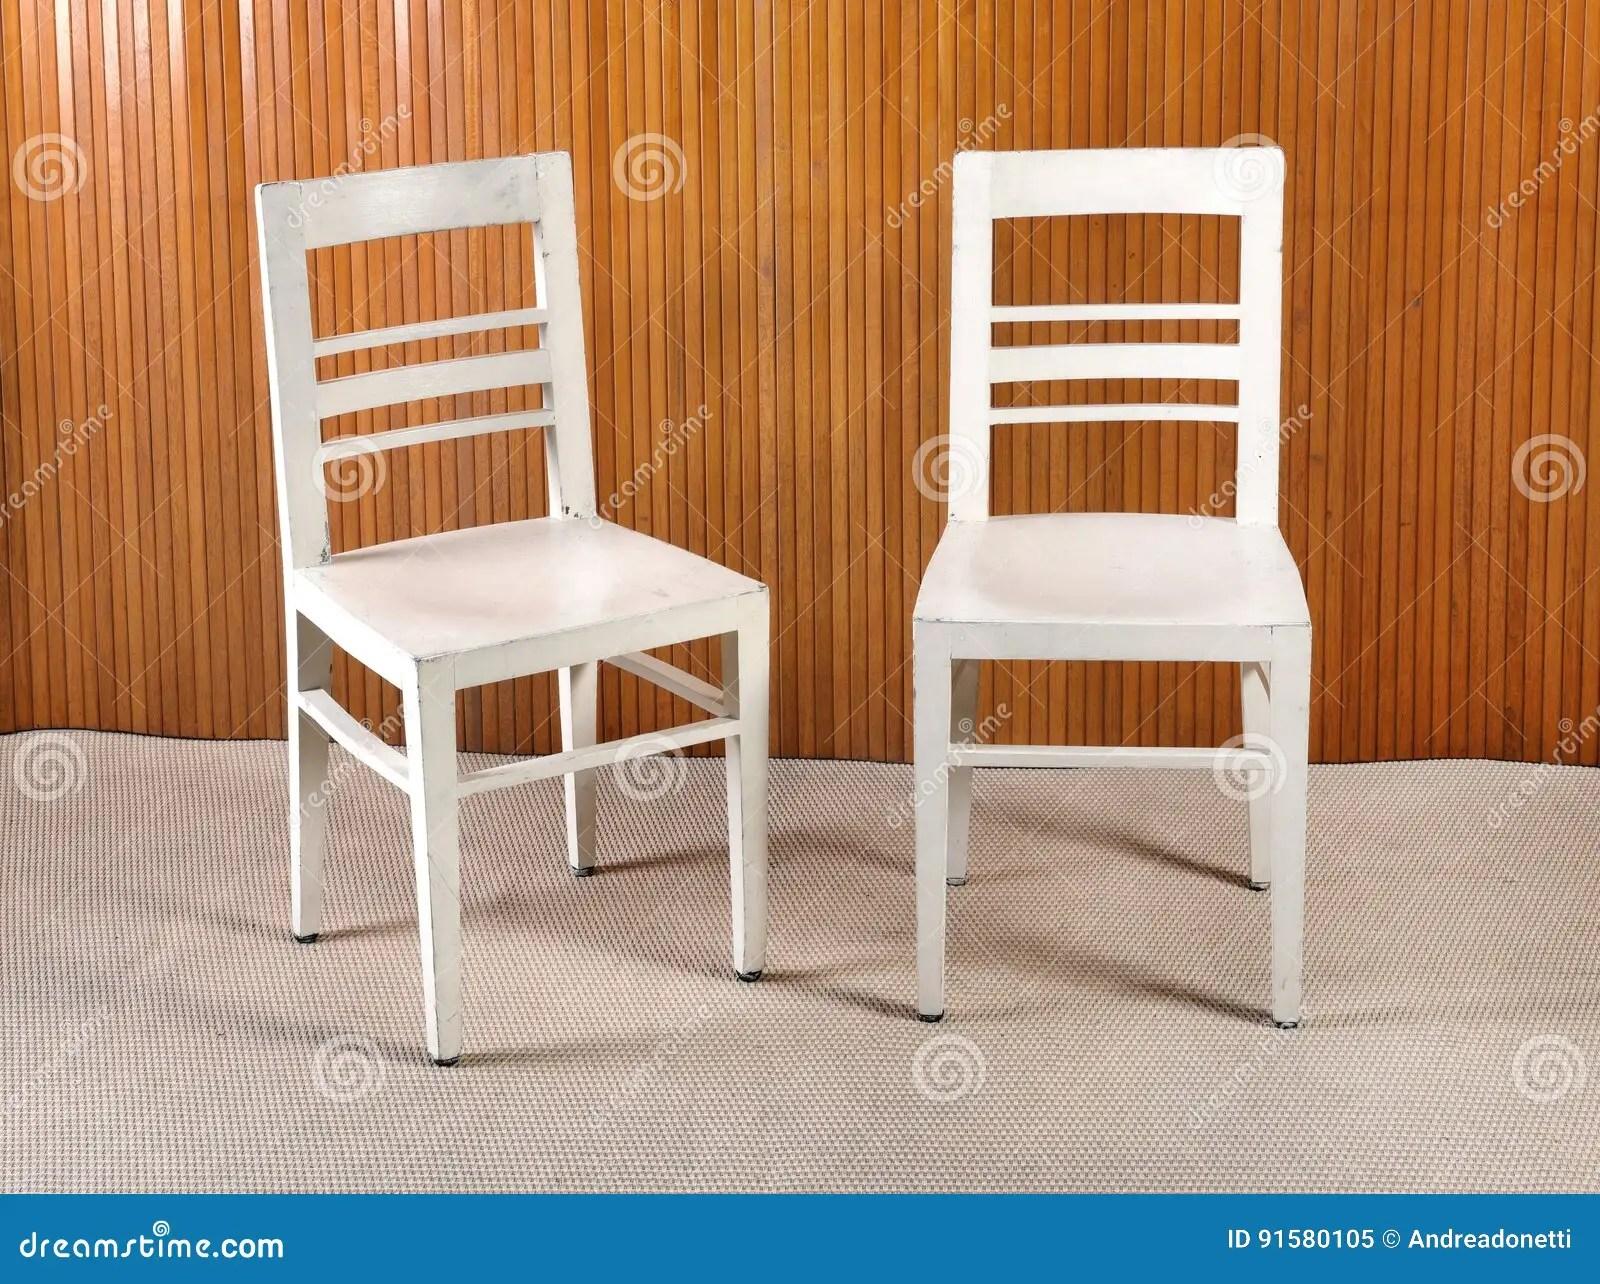 wood kitchen chairs price pfister faucet replacement parts 两把简单的白色被绘的木厨房椅子库存图片 图片包括有位子 厨房 家具 两把简单的白色被绘的木厨房椅子